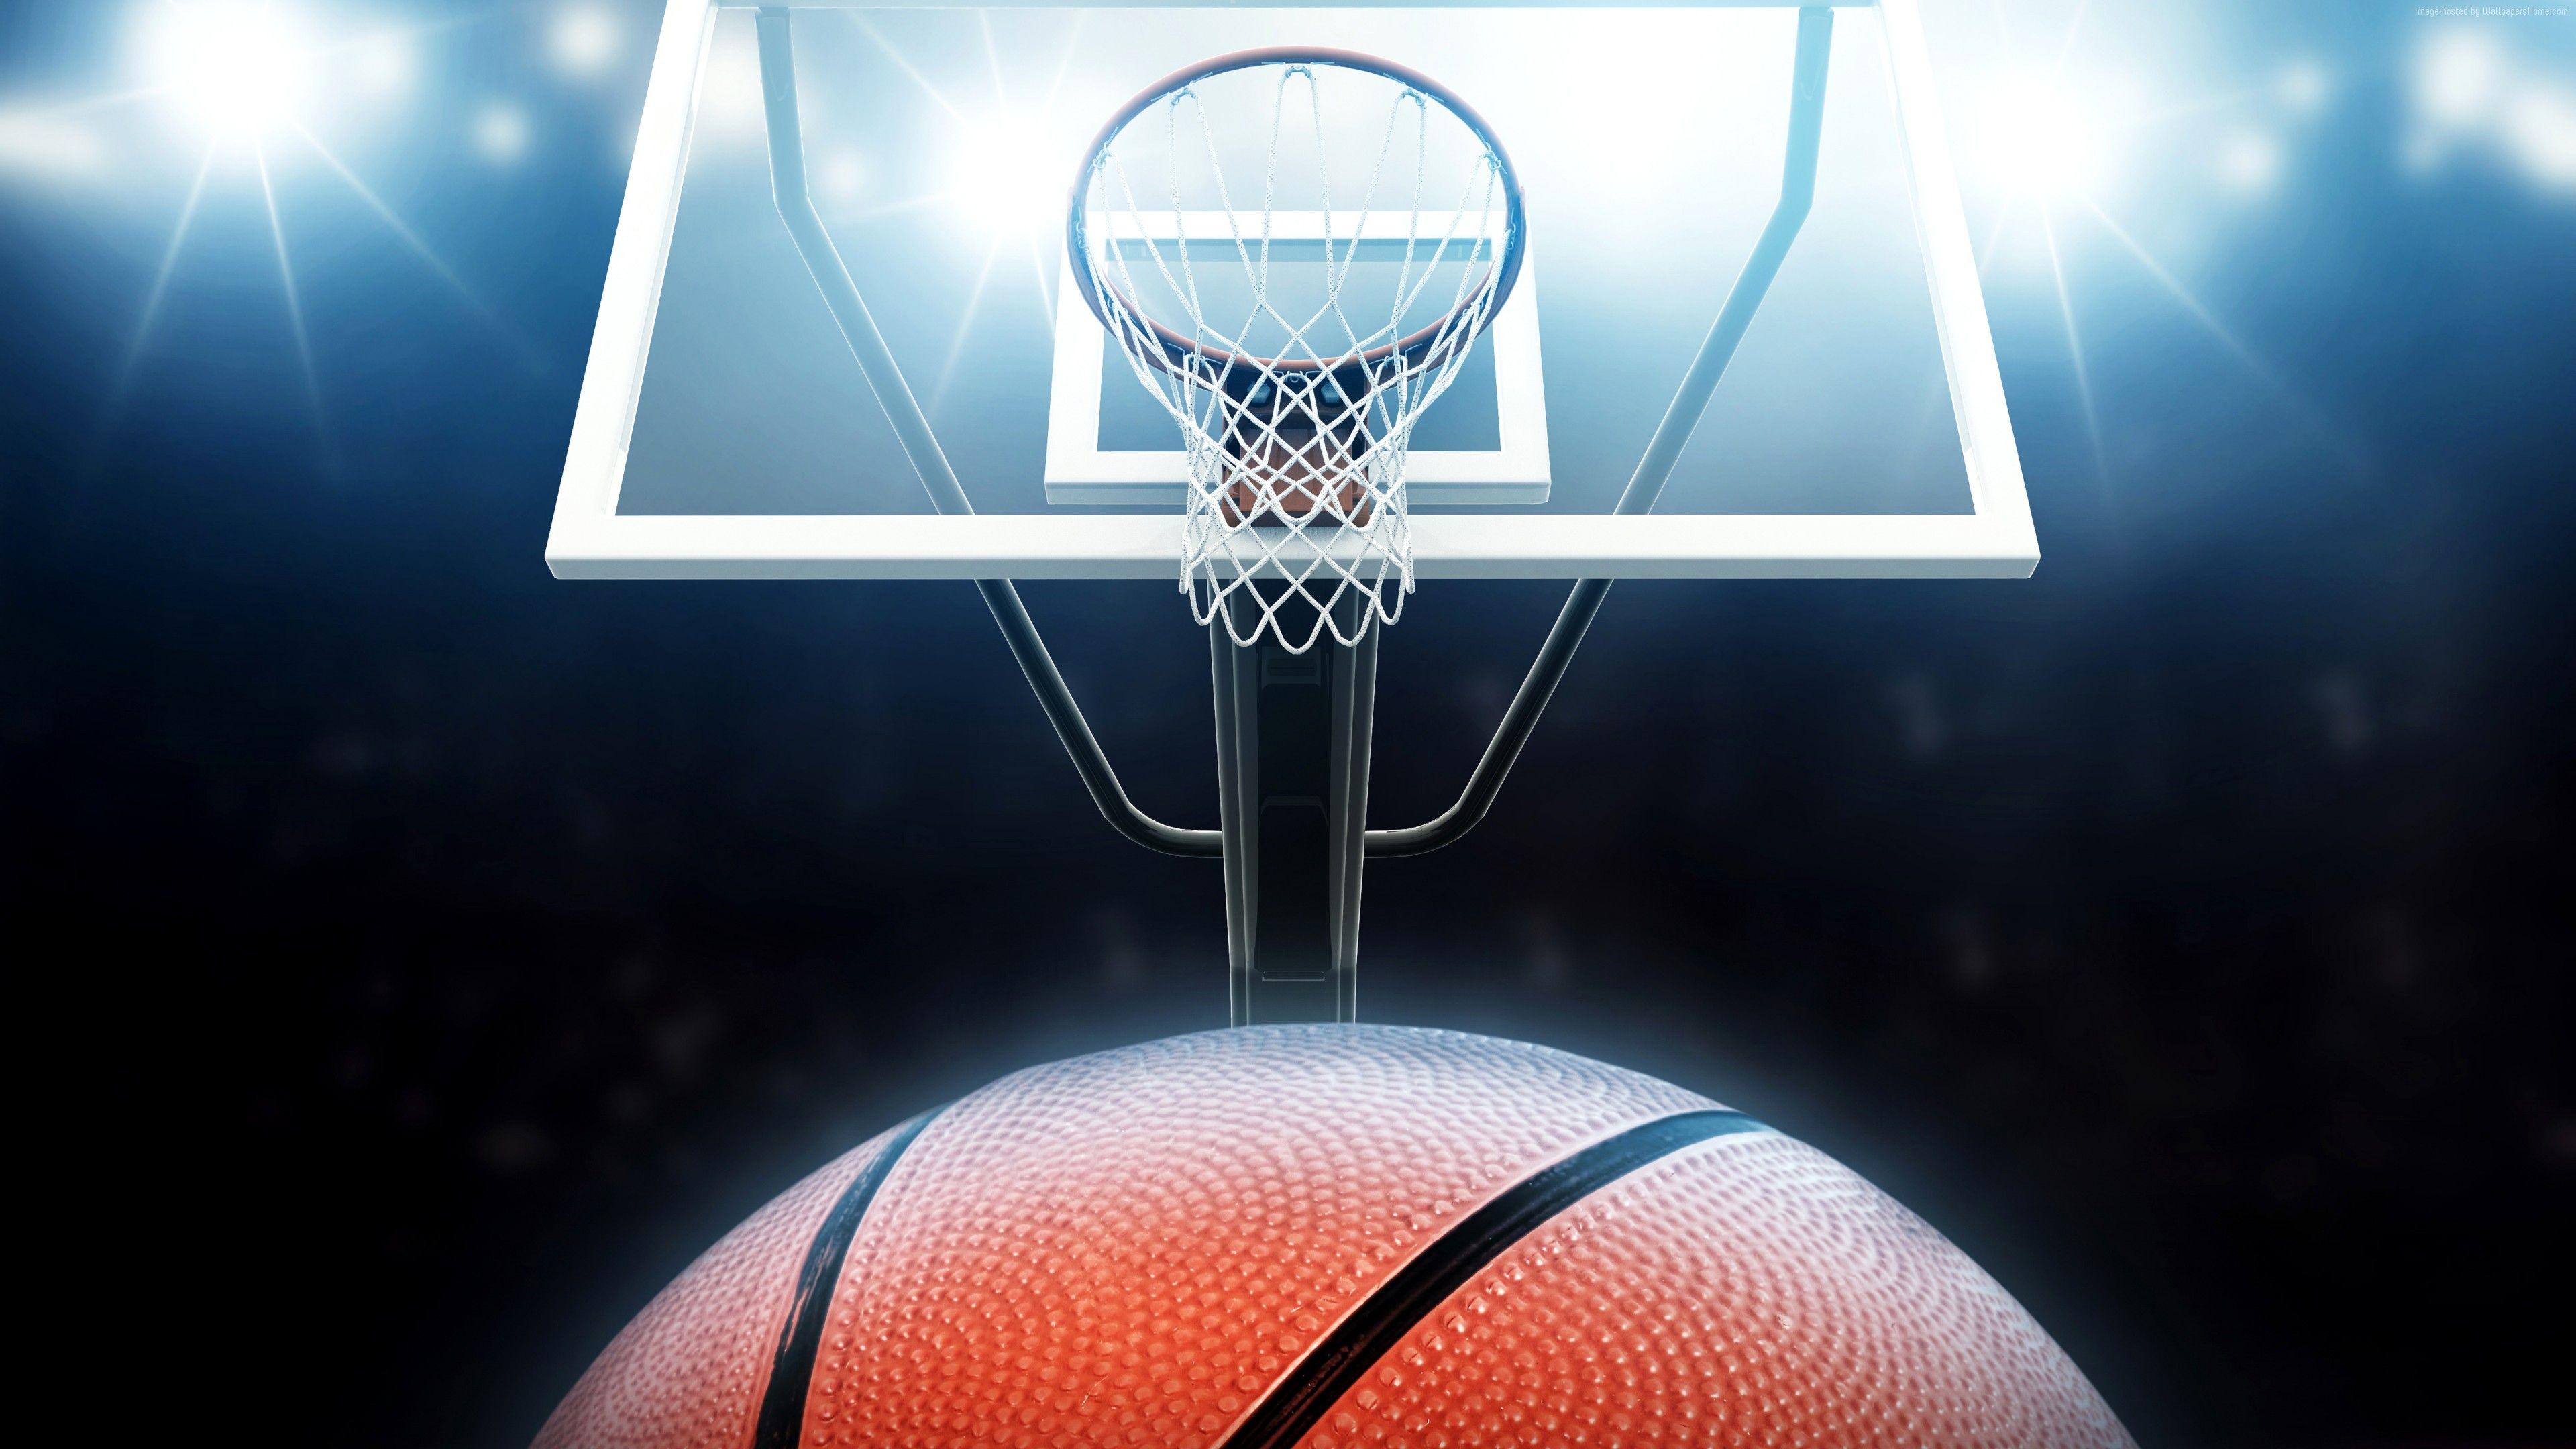 4K Basketball Wallpapers   Top 4K Basketball Backgrounds 3840x2160